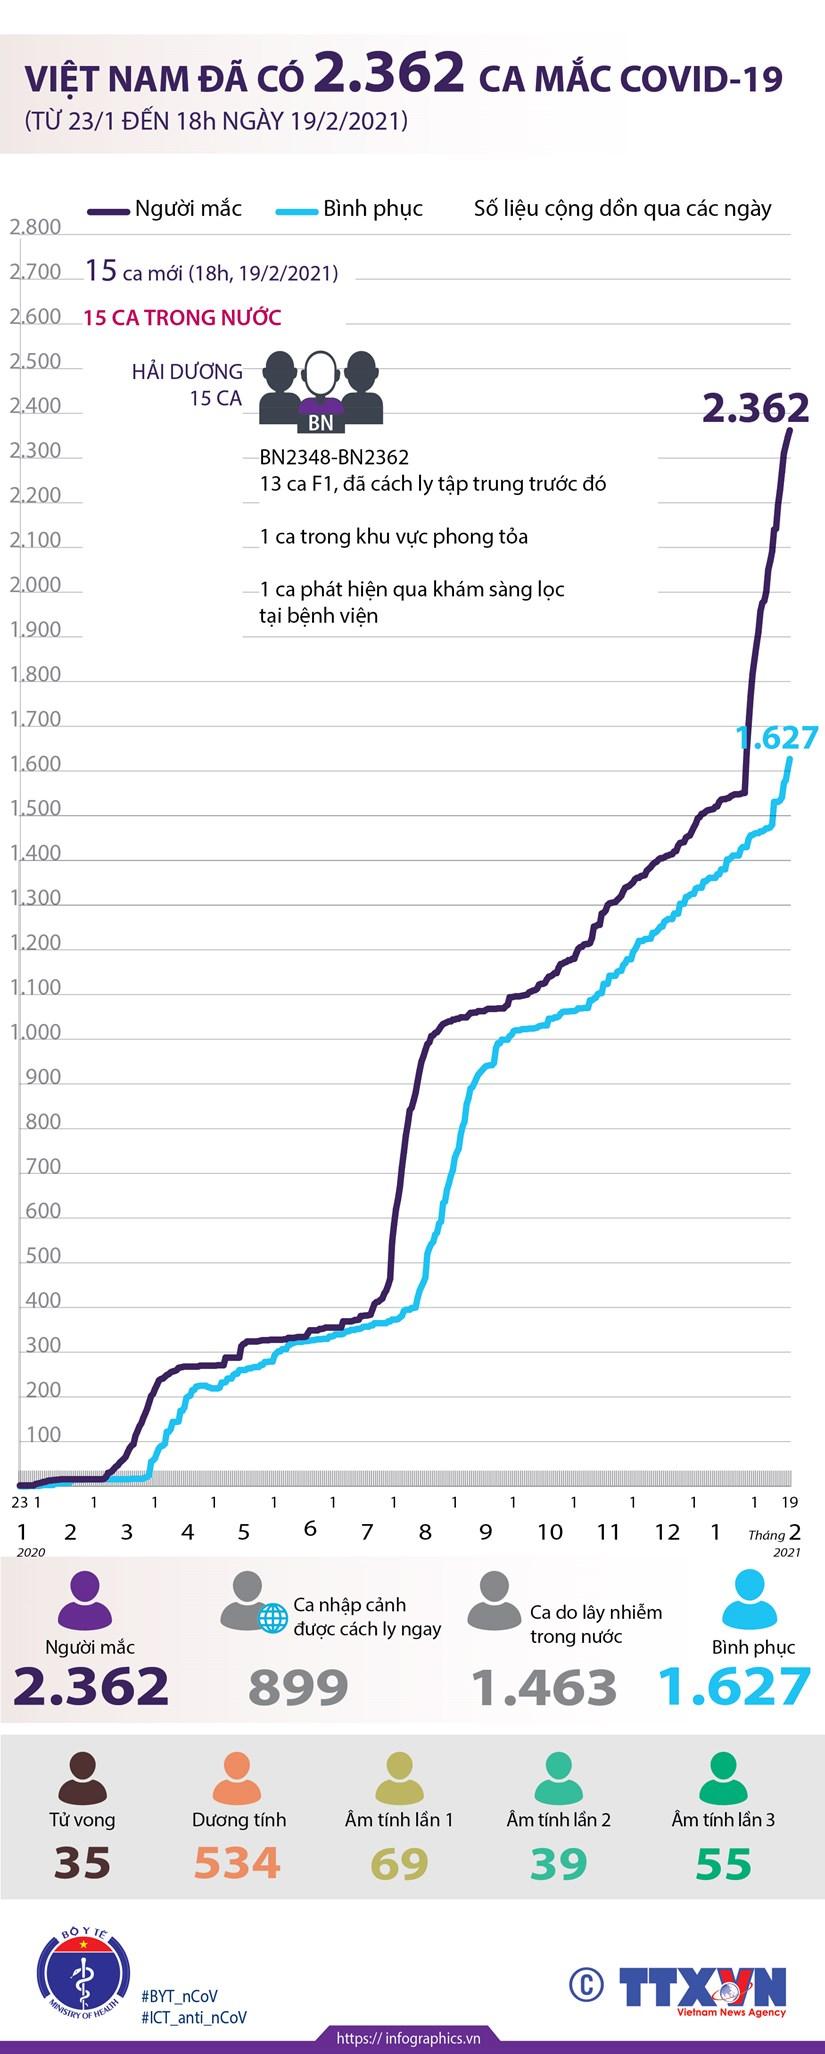 [Infographics] Viet Nam da ghi nhan 2.362 ca mac COVID-19 hinh anh 1